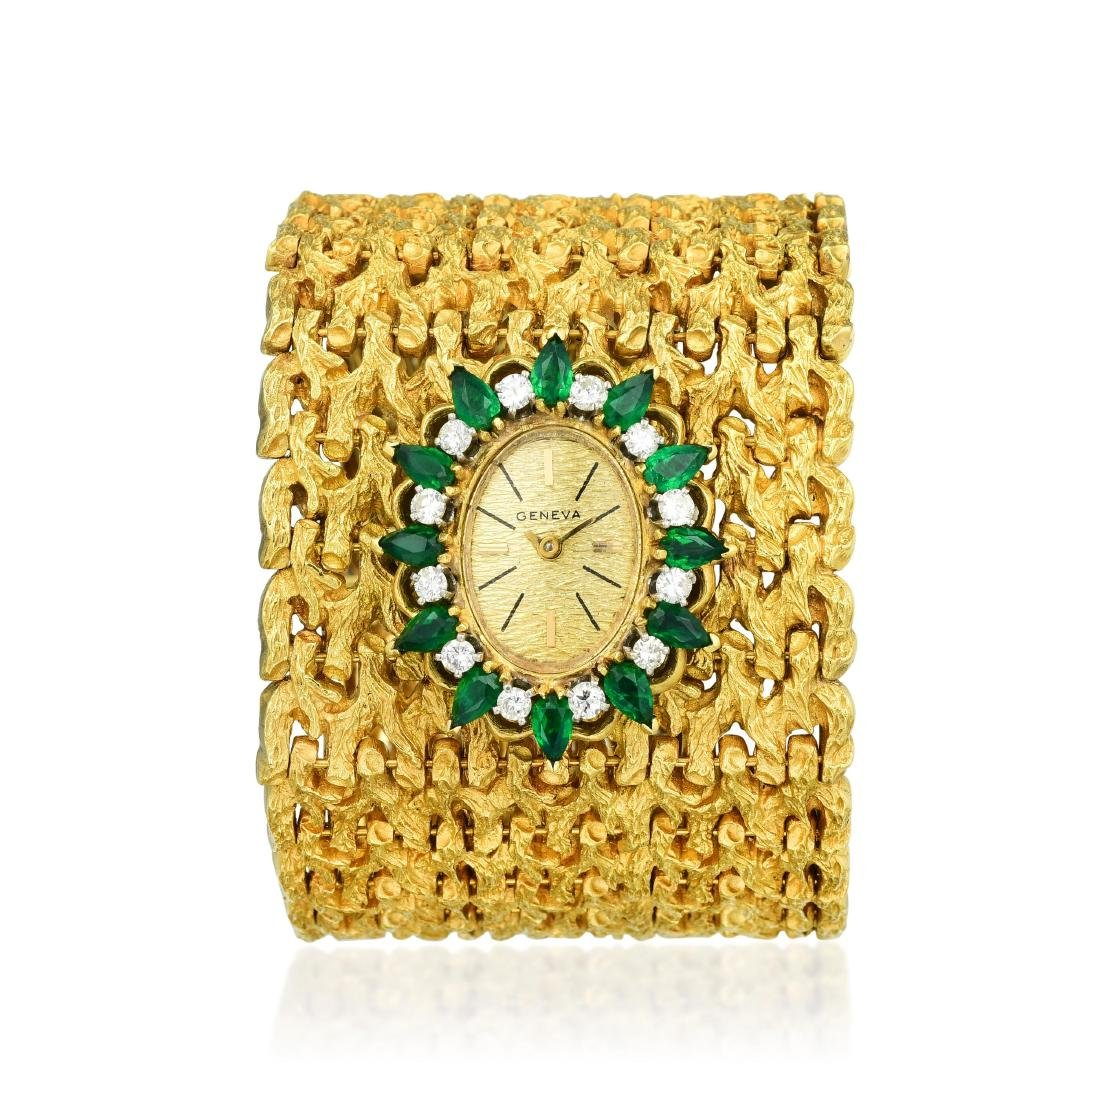 A Wide Emerald and Diamond Watch Bracelet